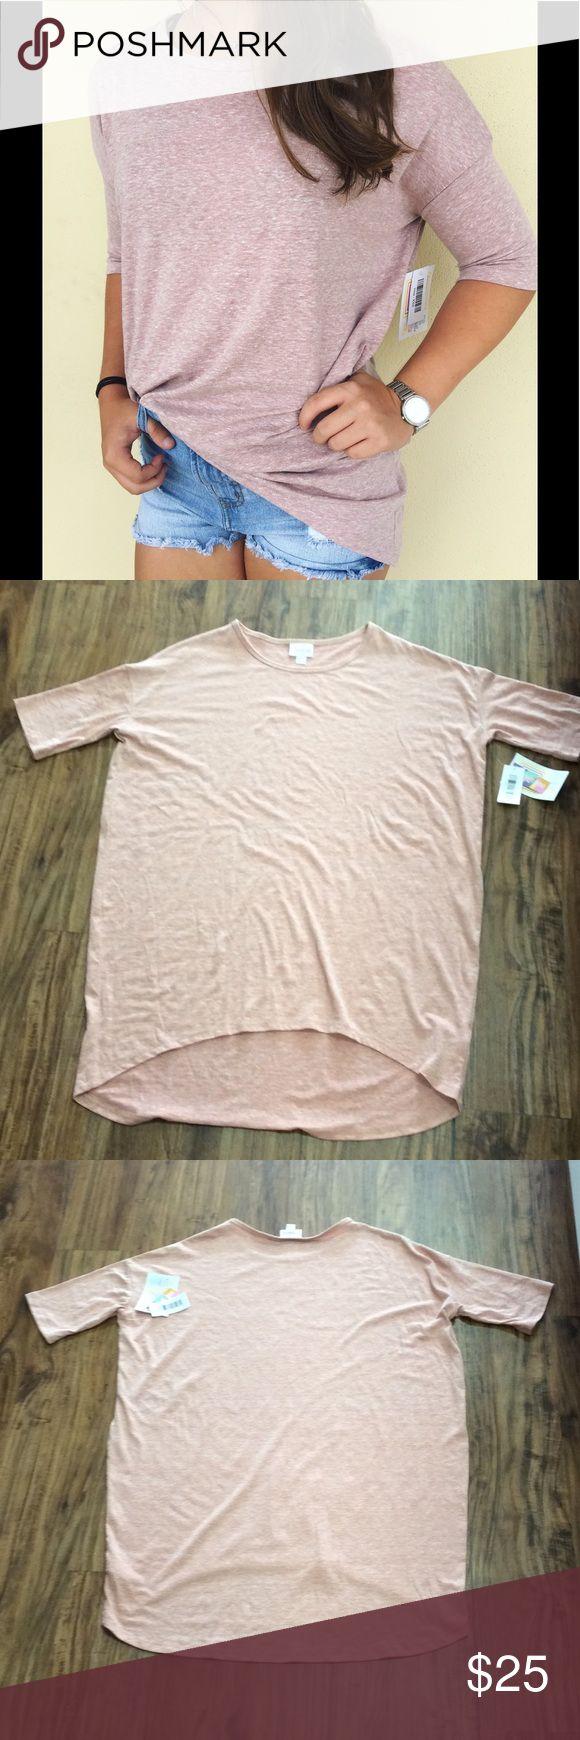 LulaRoe Shirt Brand New with tags- Irma shirt - no trends LuLaRoe Tops Tees - Short Sleeve